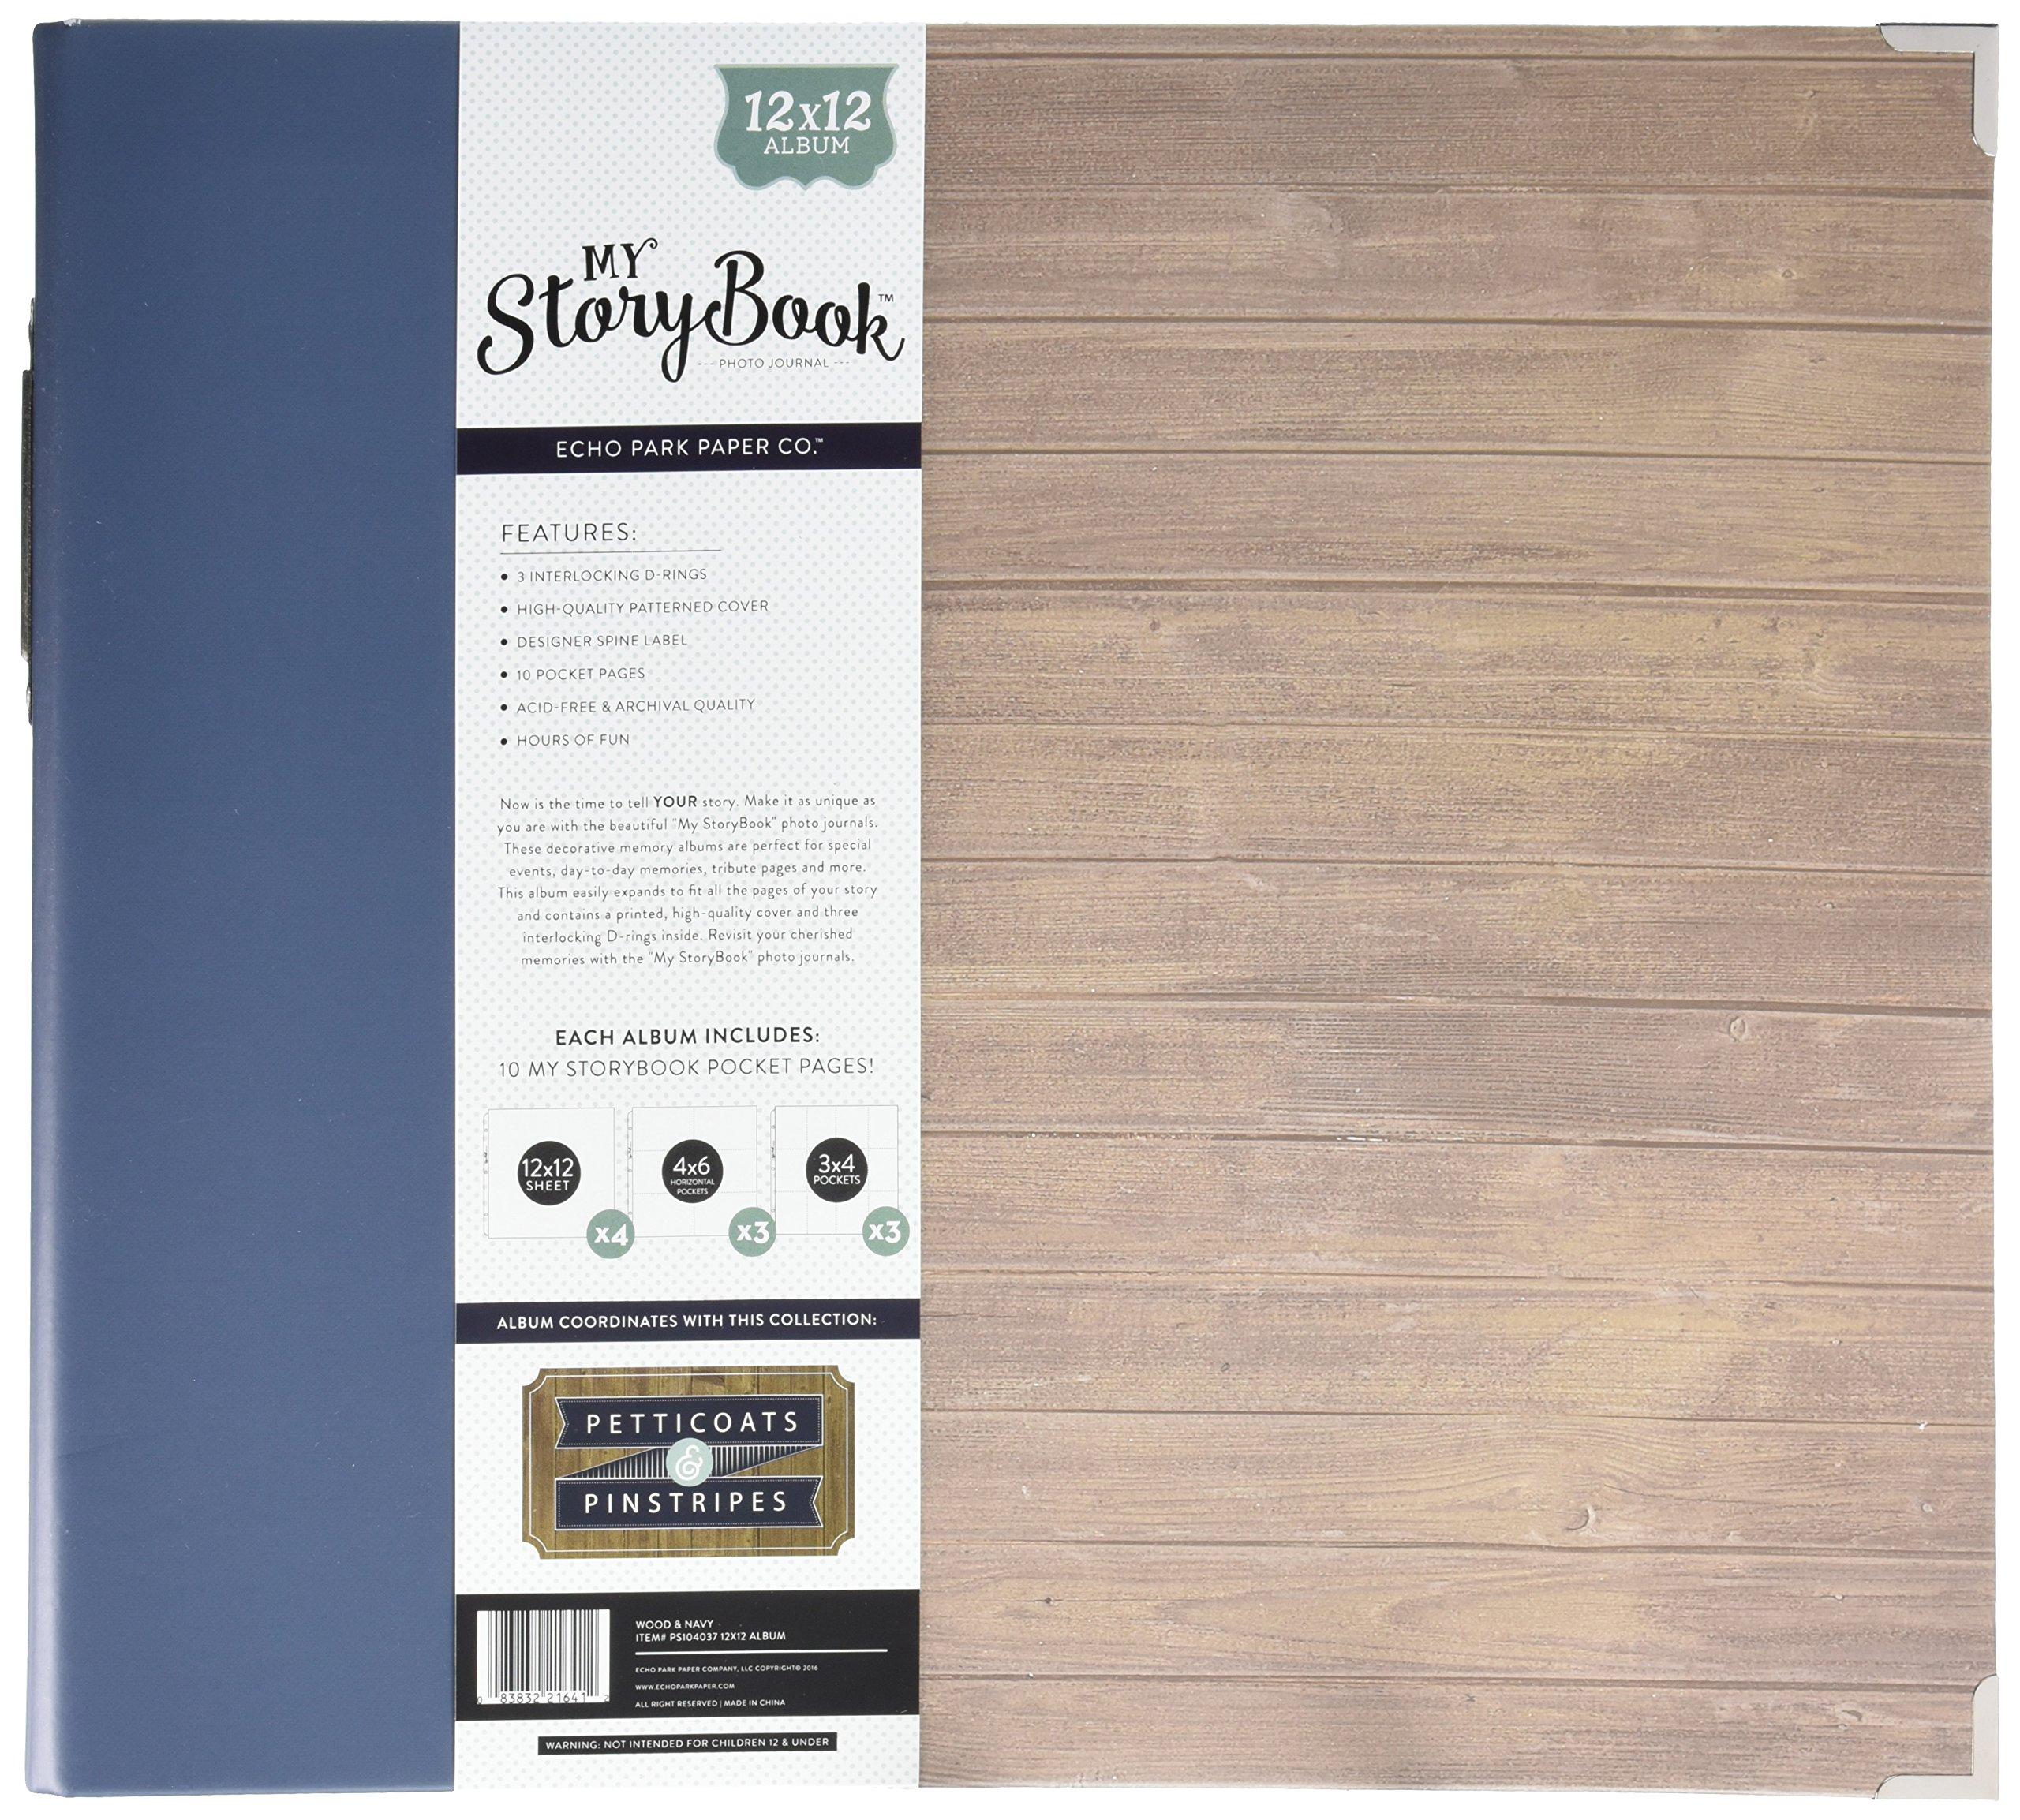 Echo Park Paper PS104037 My Storybook Album Photo Journal, 12'' x 12'', Petticoats & Pinstripes Boy Wood, Multicolor